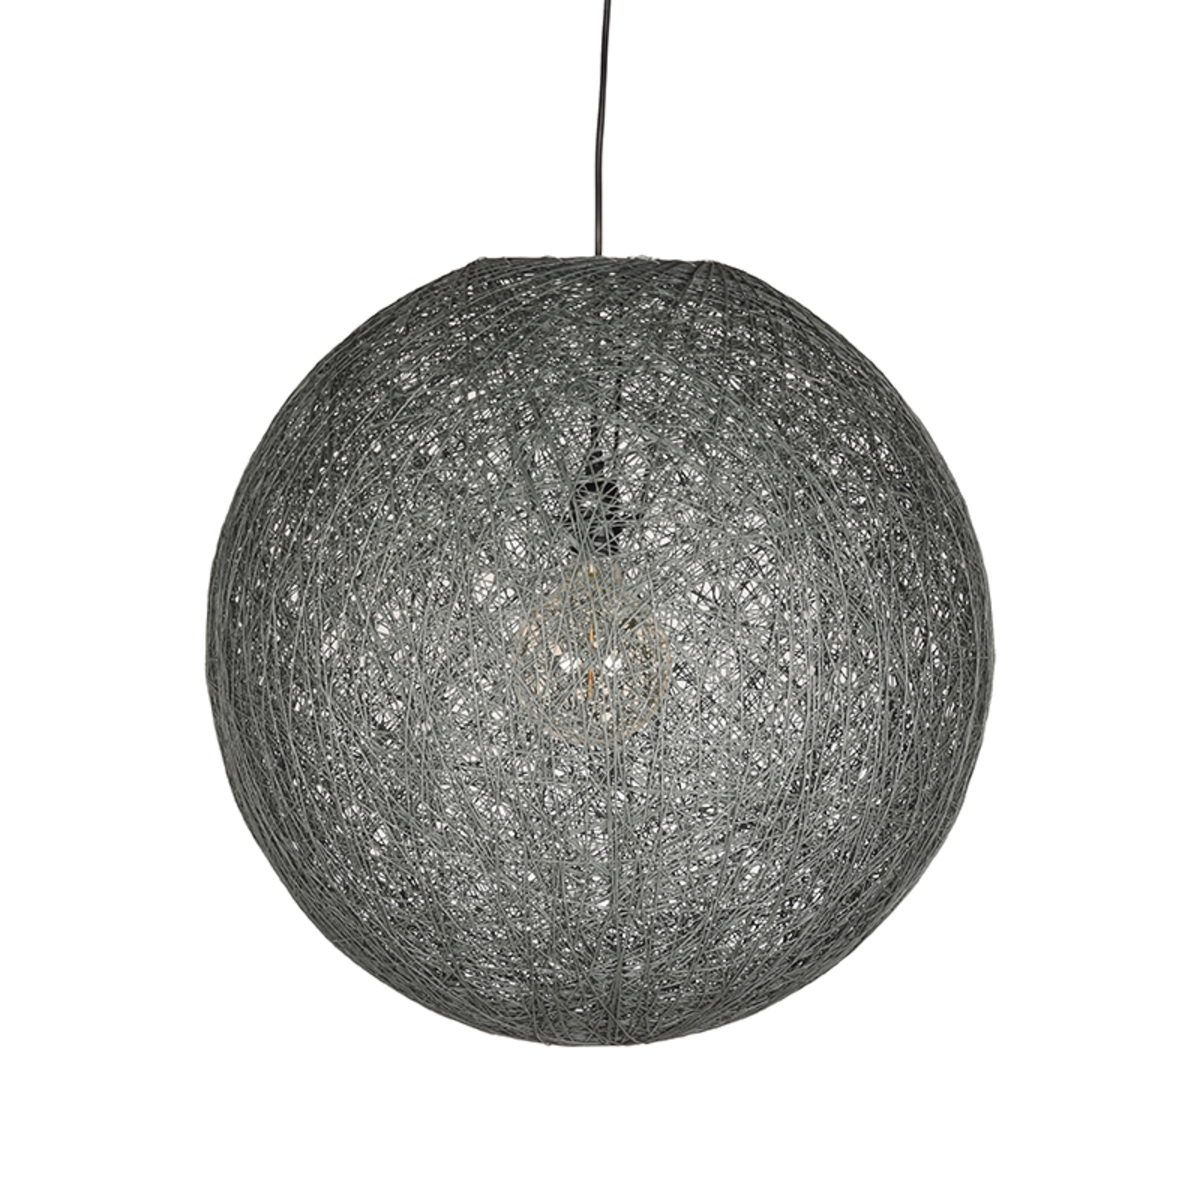 Hanglamp Twist - Grijs - Vlas - 55 cm